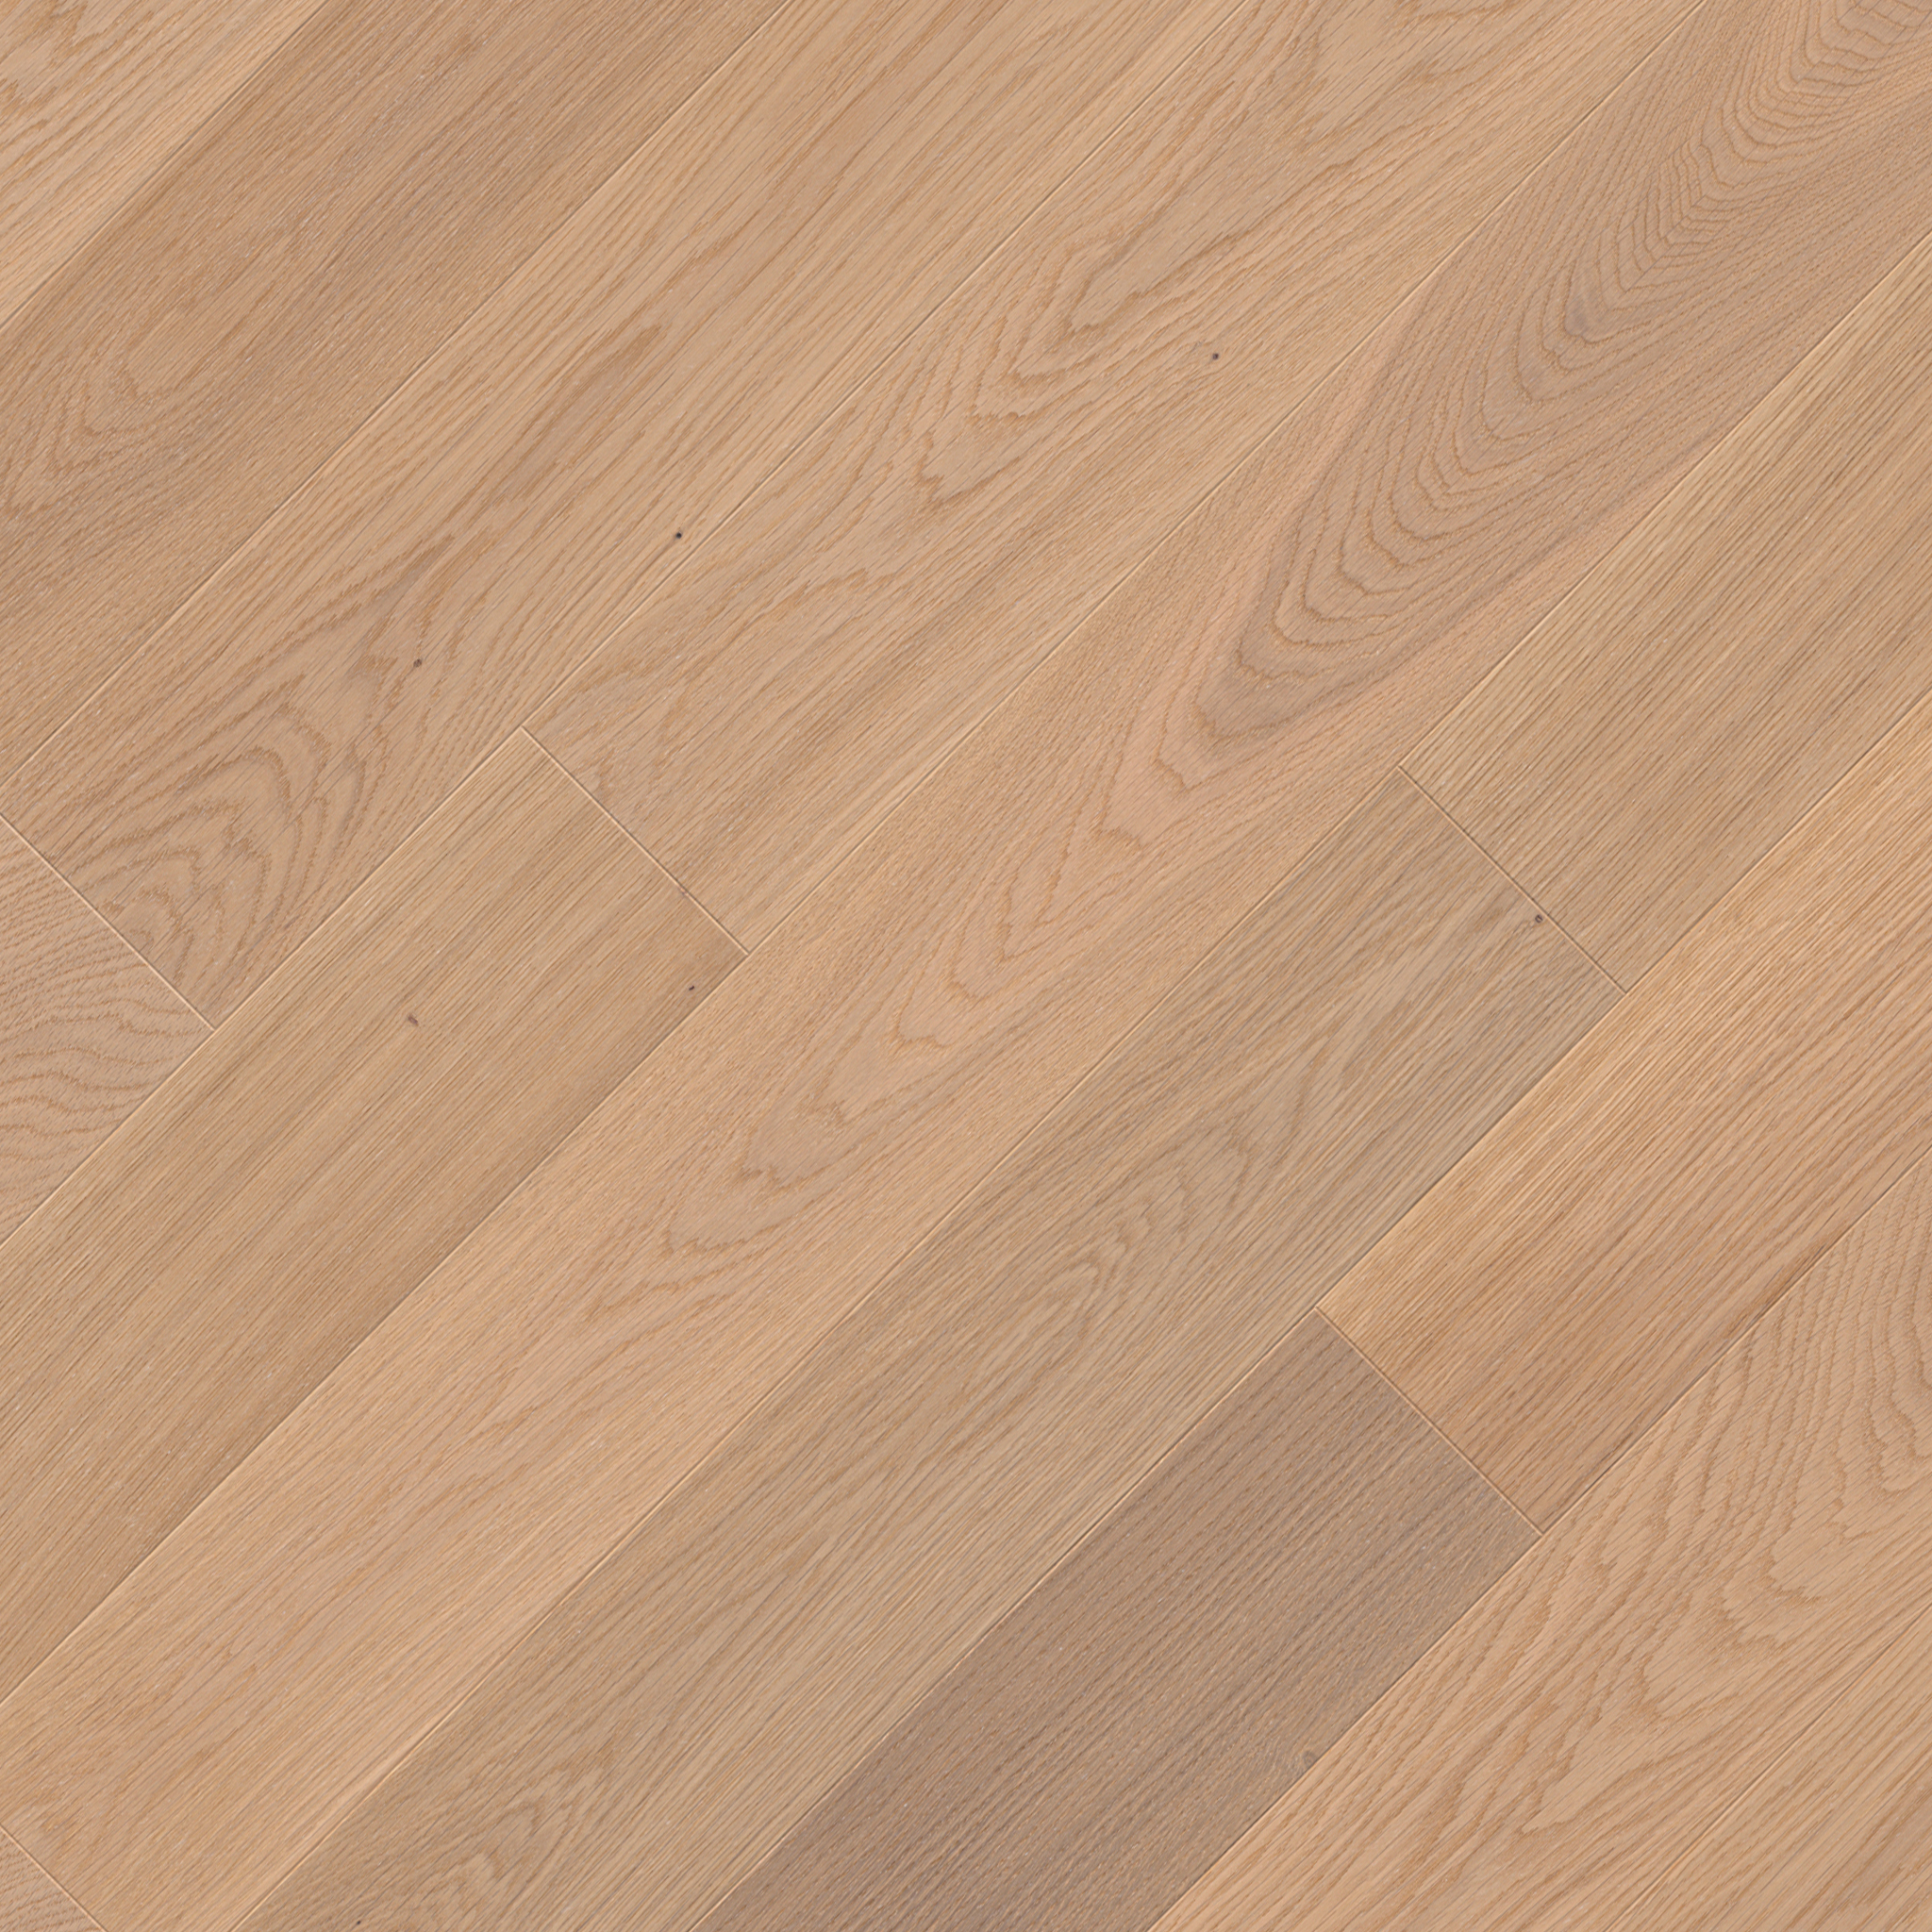 Floor-Art Da Vinci Eiche Prime Weiß